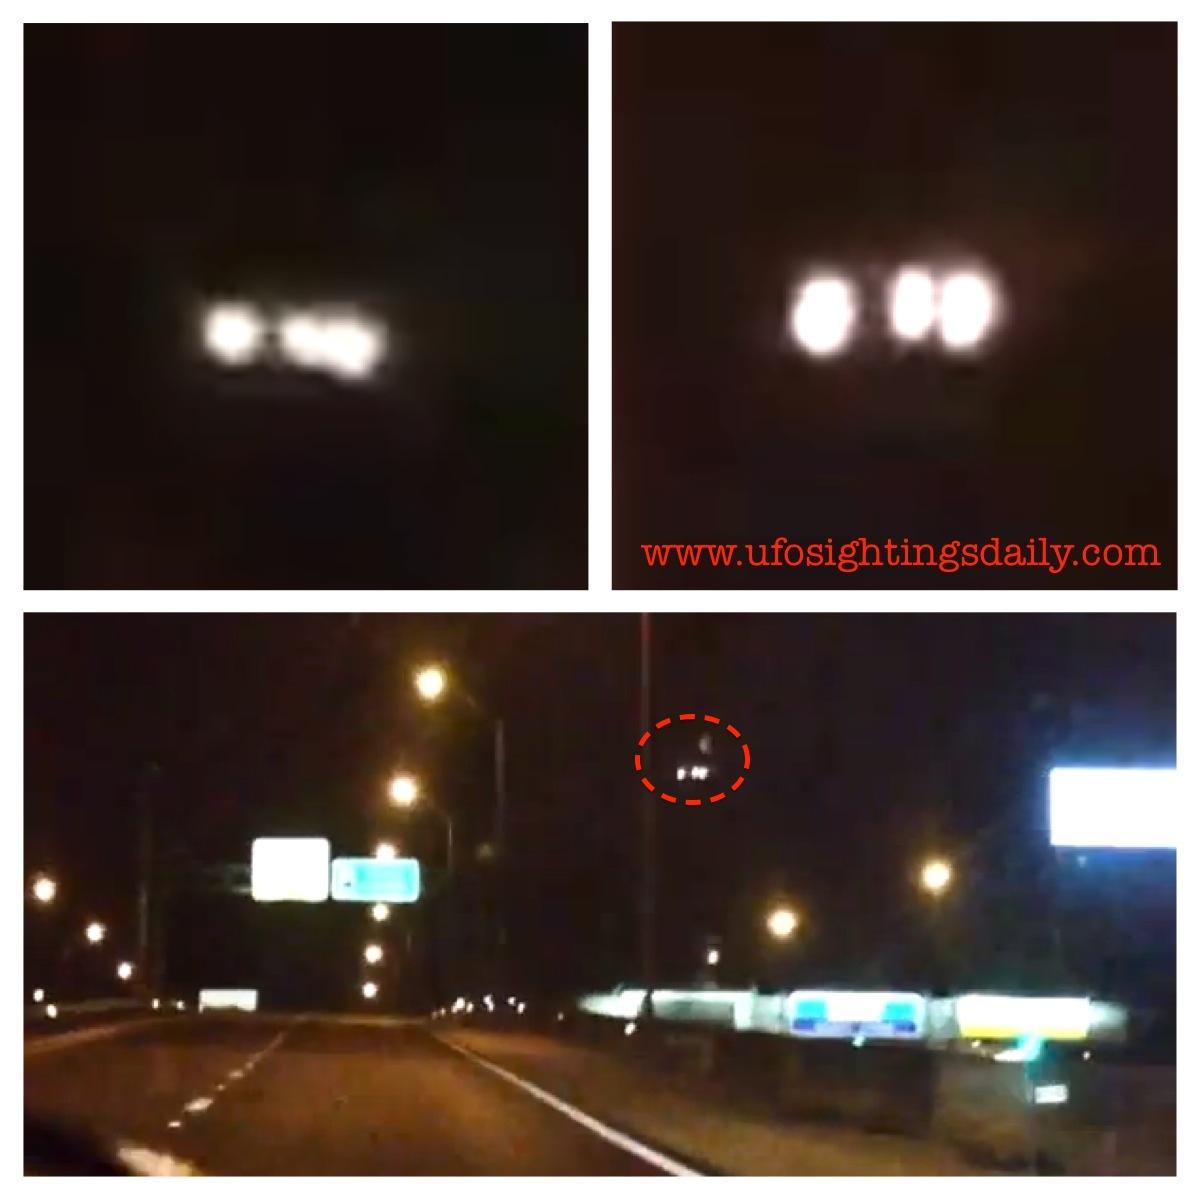 UFO SIGHTINGS DAILY: U...